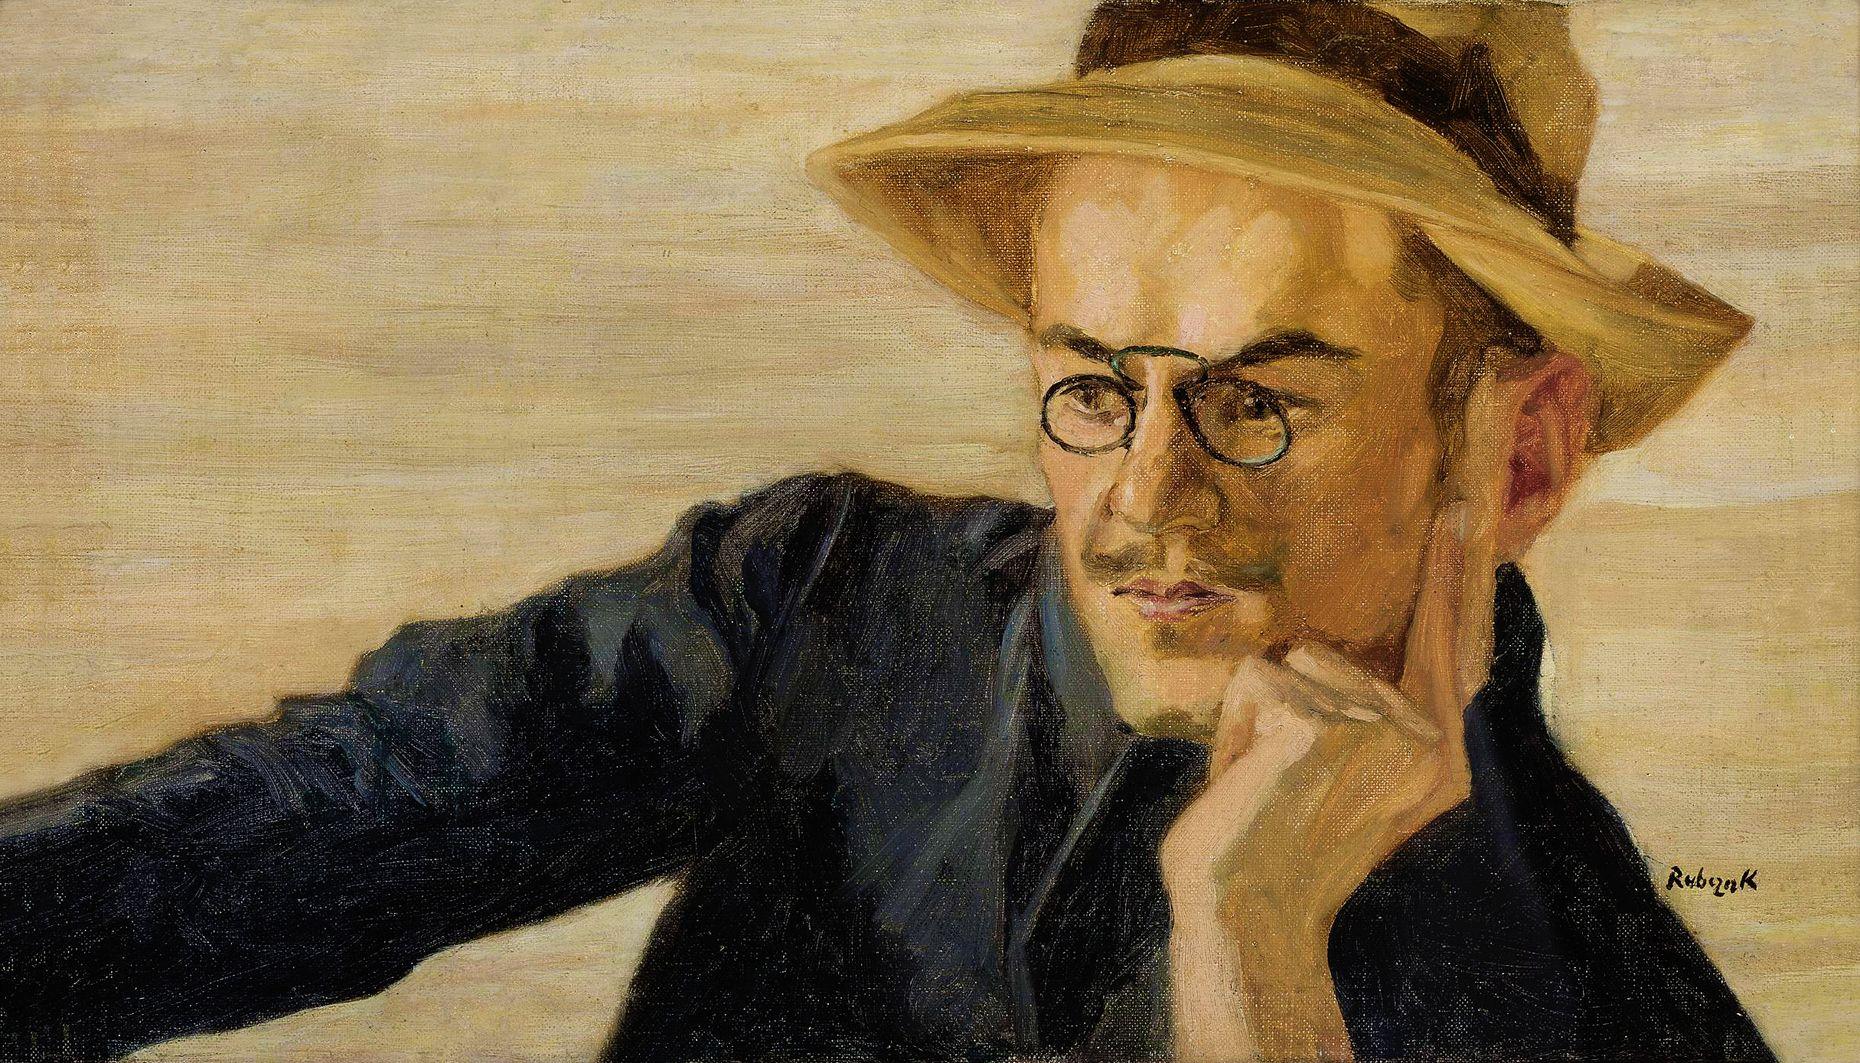 Ян Рубчак. Портрет, 1941; олія, полотно; NMW